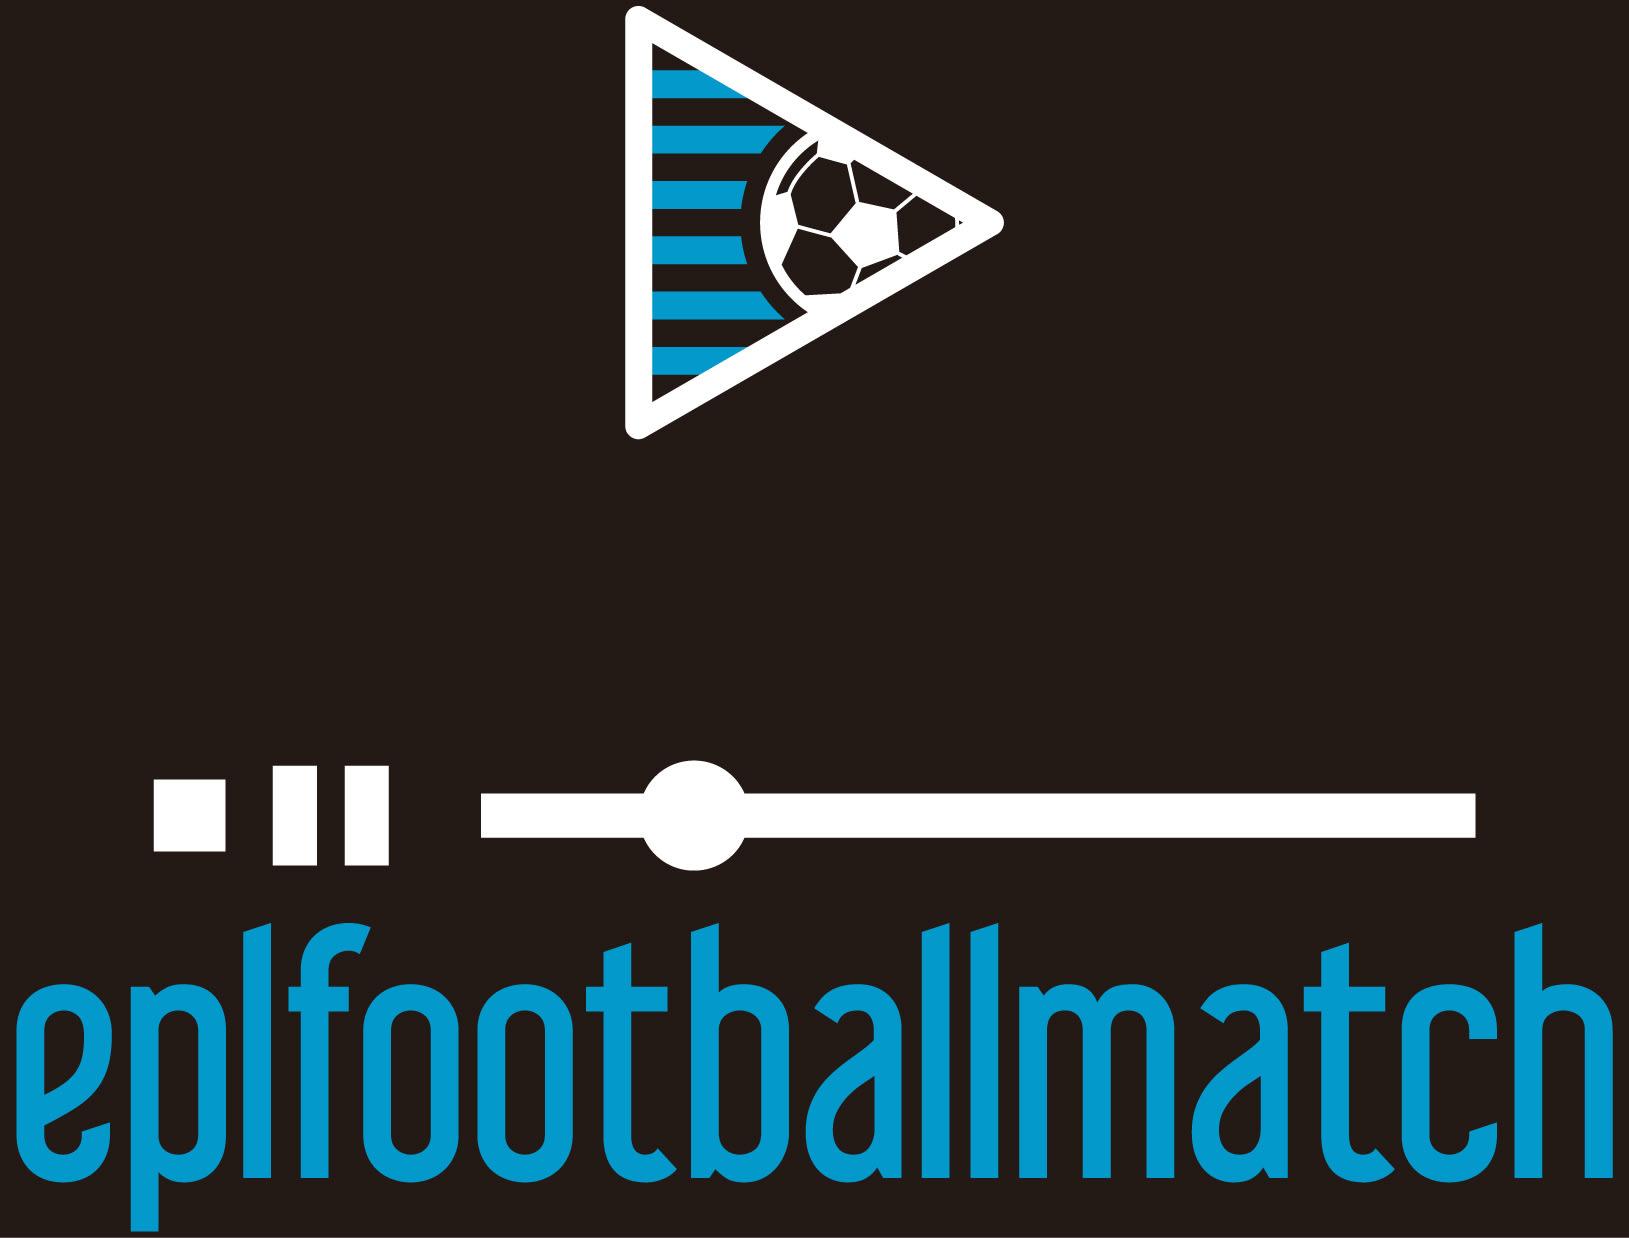 Eplfootballmatch.com